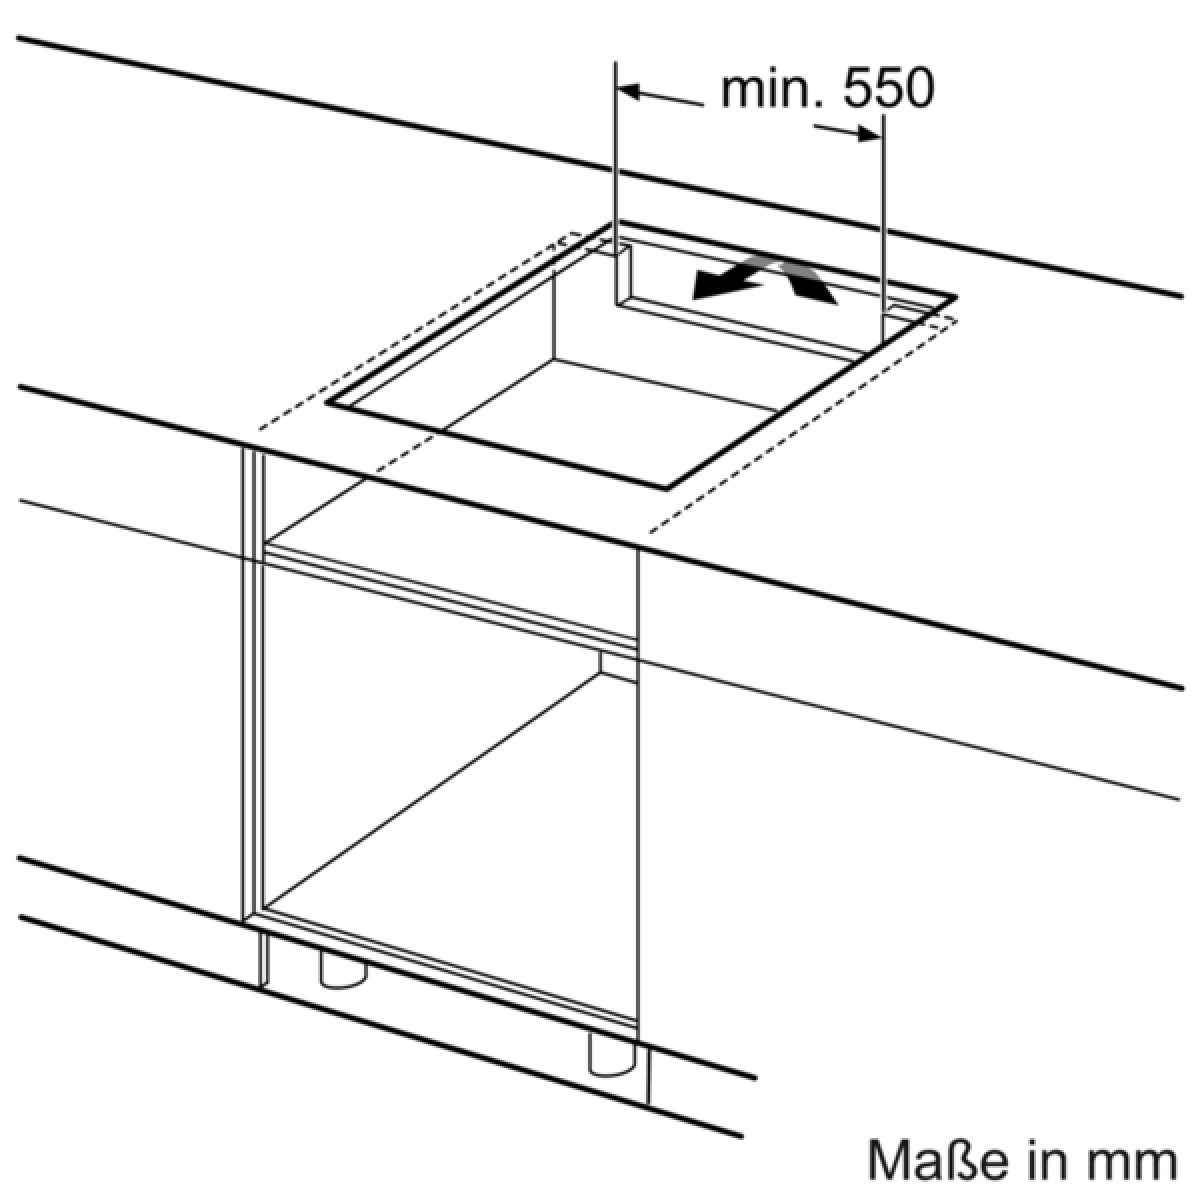 neff tbb3640n t36bb40n1 induktions kochfeld autark mit touchcontrol bedienung g nstig kaufen. Black Bedroom Furniture Sets. Home Design Ideas